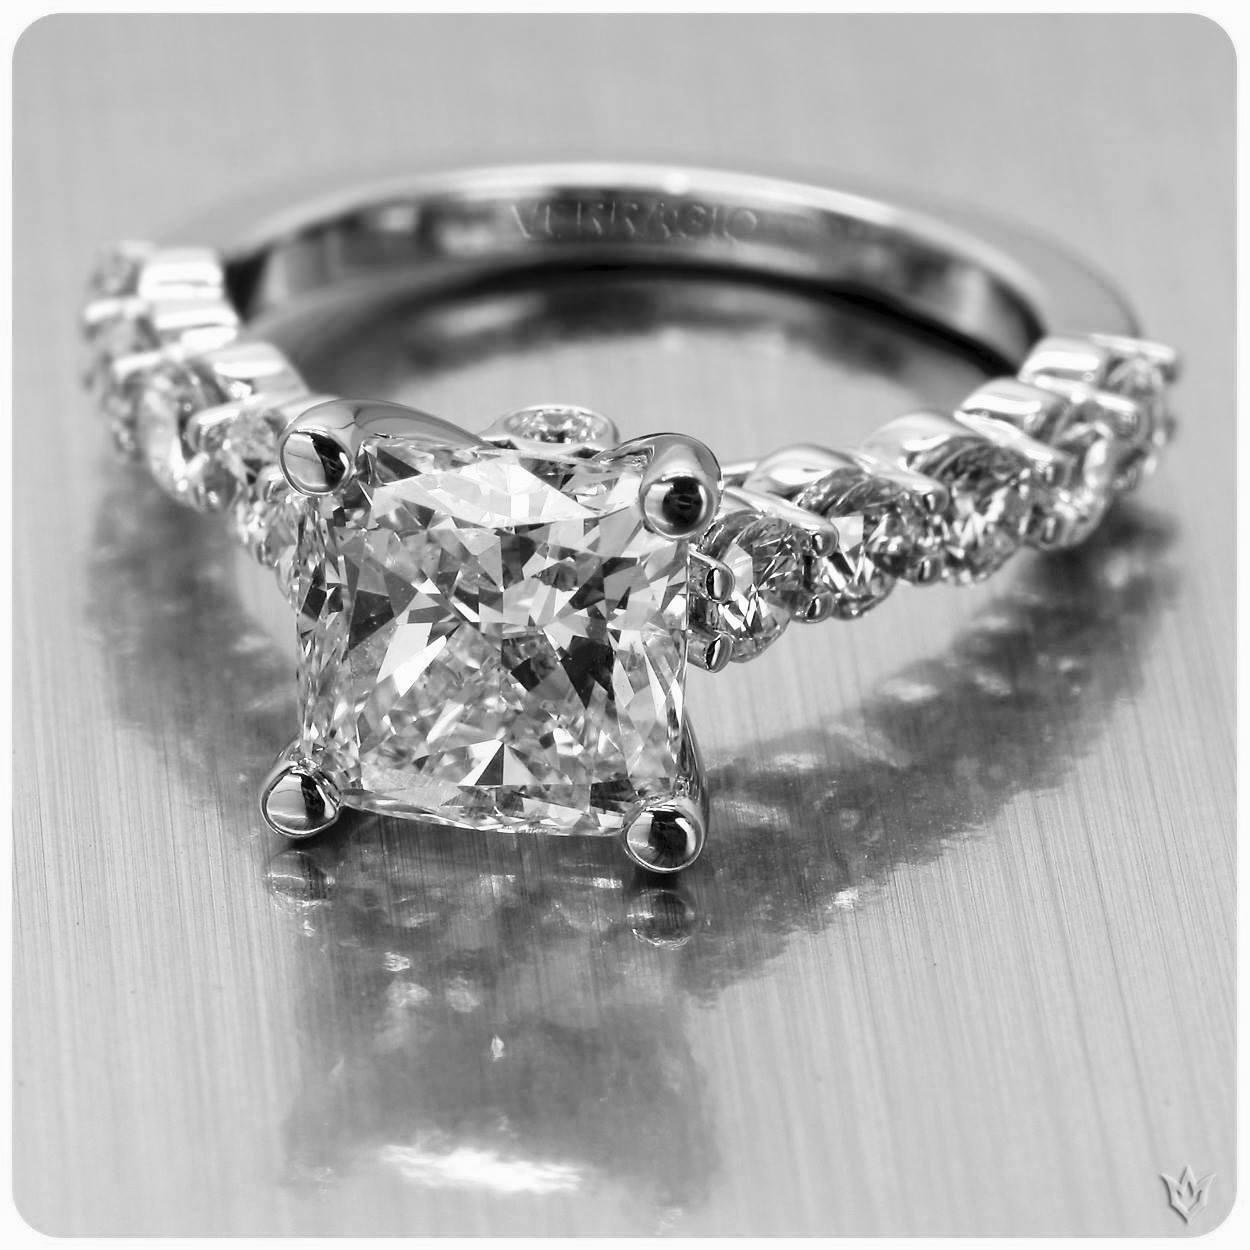 Emerald Lady Jewelry image 64